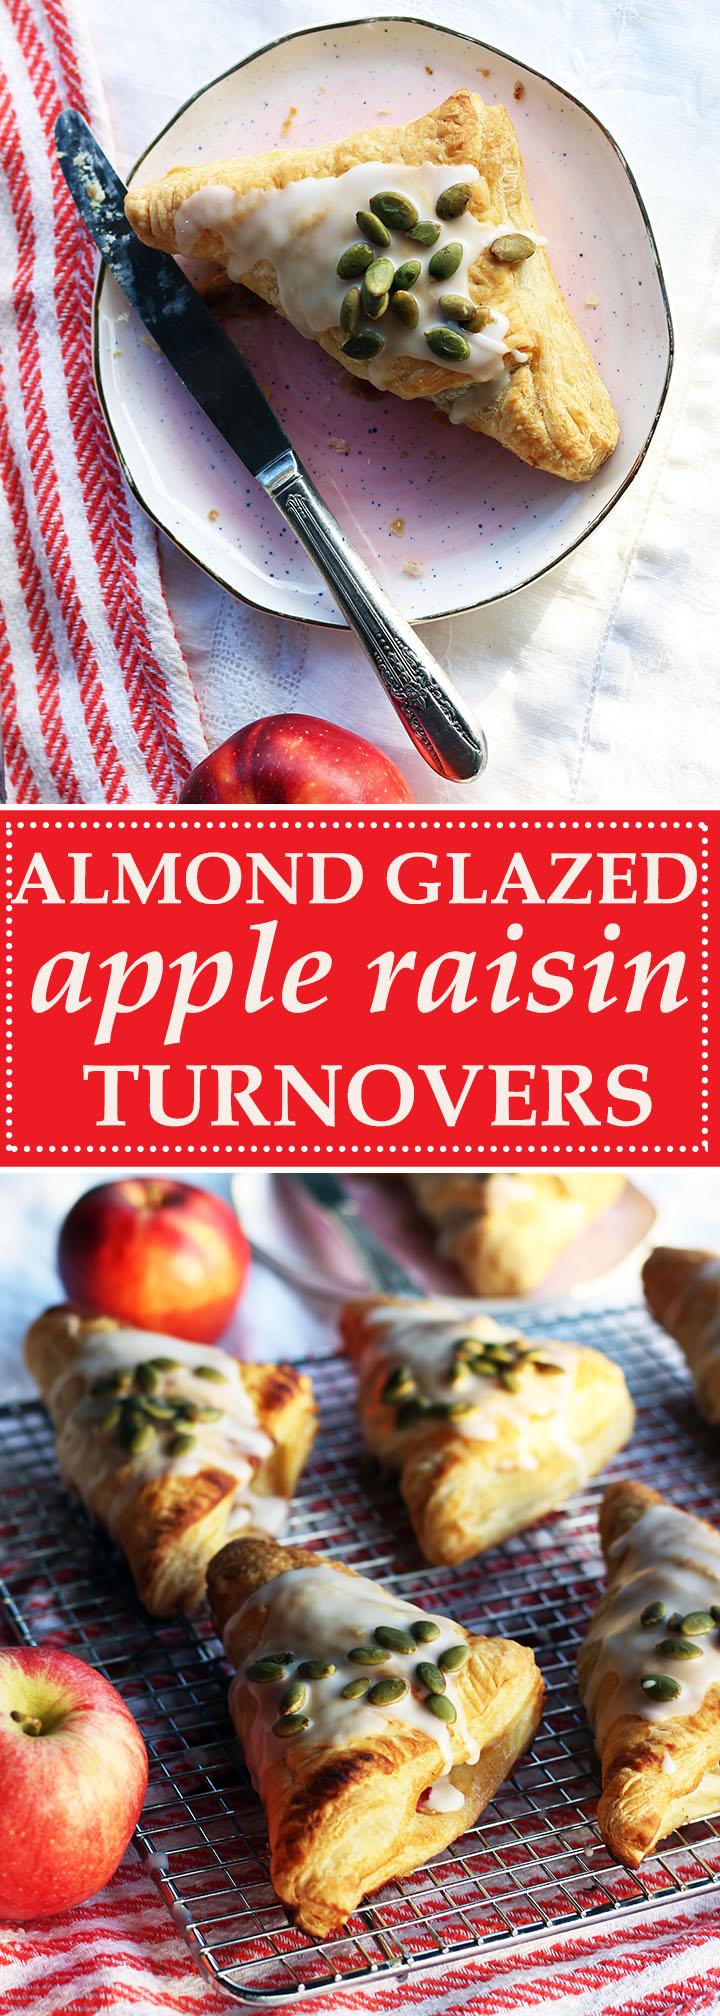 Almond Glazed Apple Raisin Turnovers | www.thetableofcontents.co